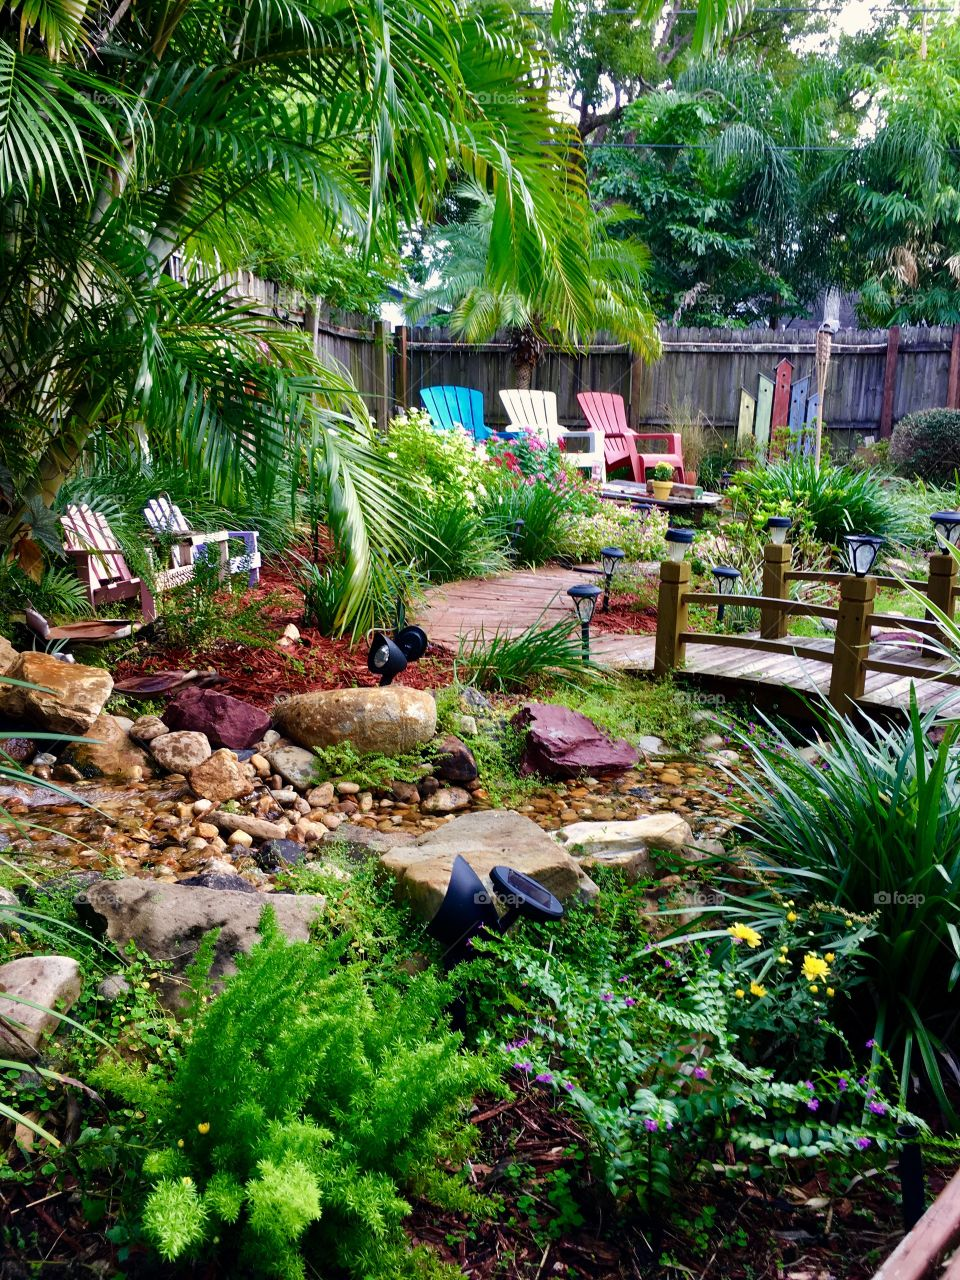 My backyard retreat. Where I come to feel enormous peace and the beauty of God's creativity.